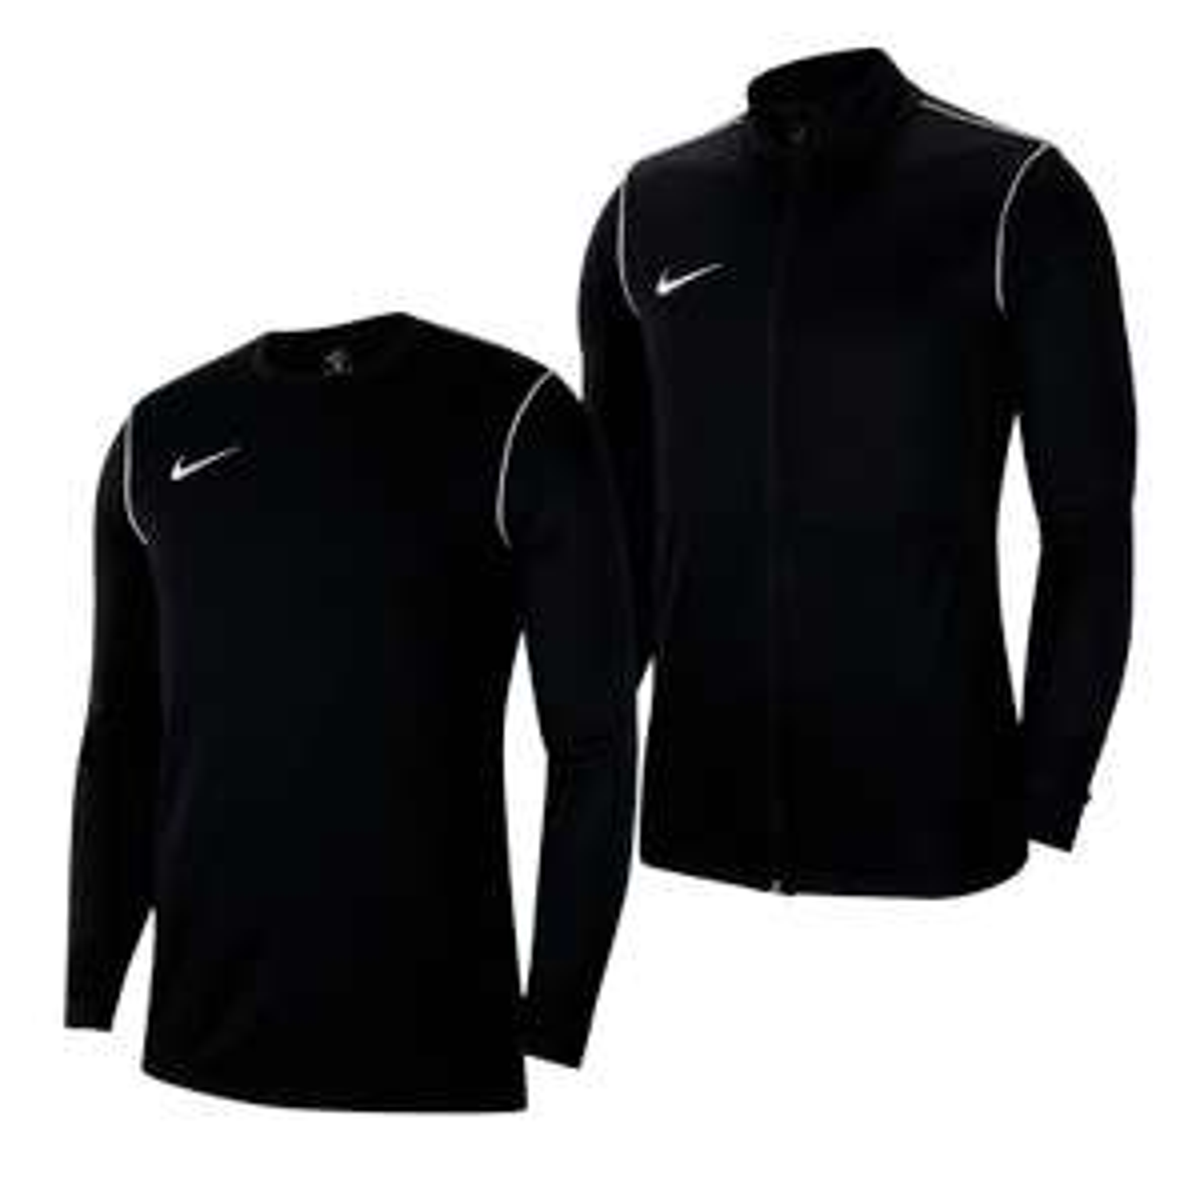 Nike Park 20 Jacke + Top in 7 Farben